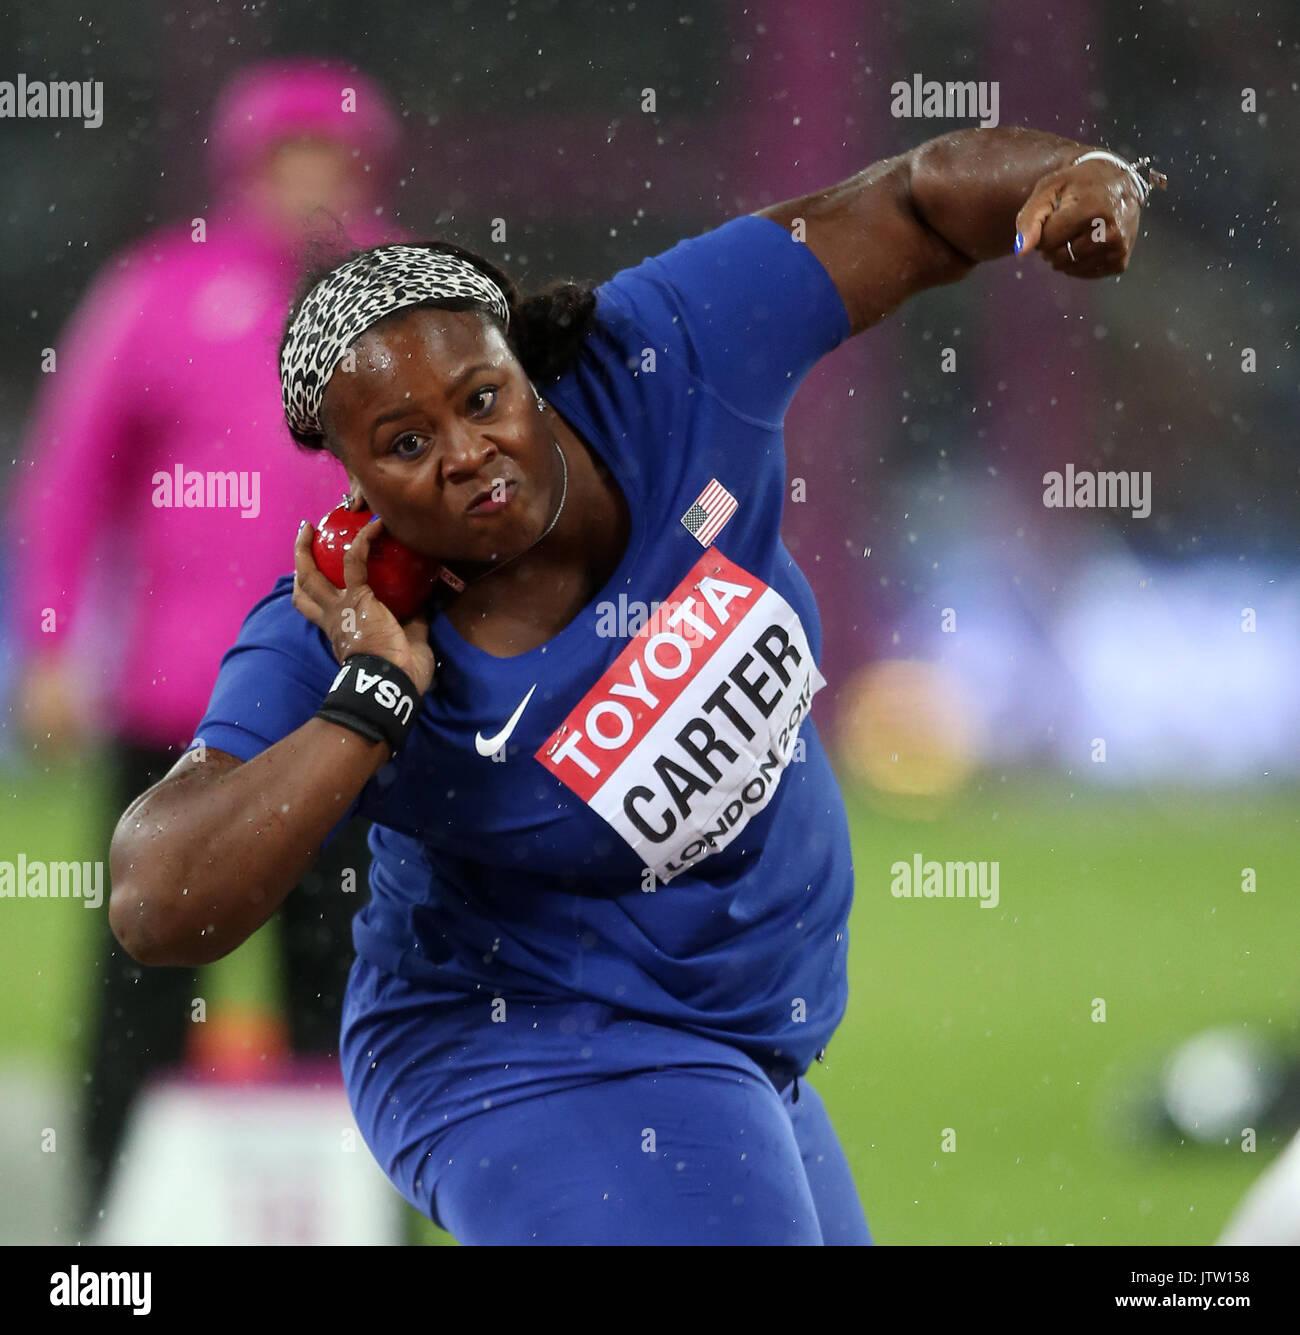 Michelle Carter Athlete >> Michelle Carter Shot Put World Athletics Championships 2017